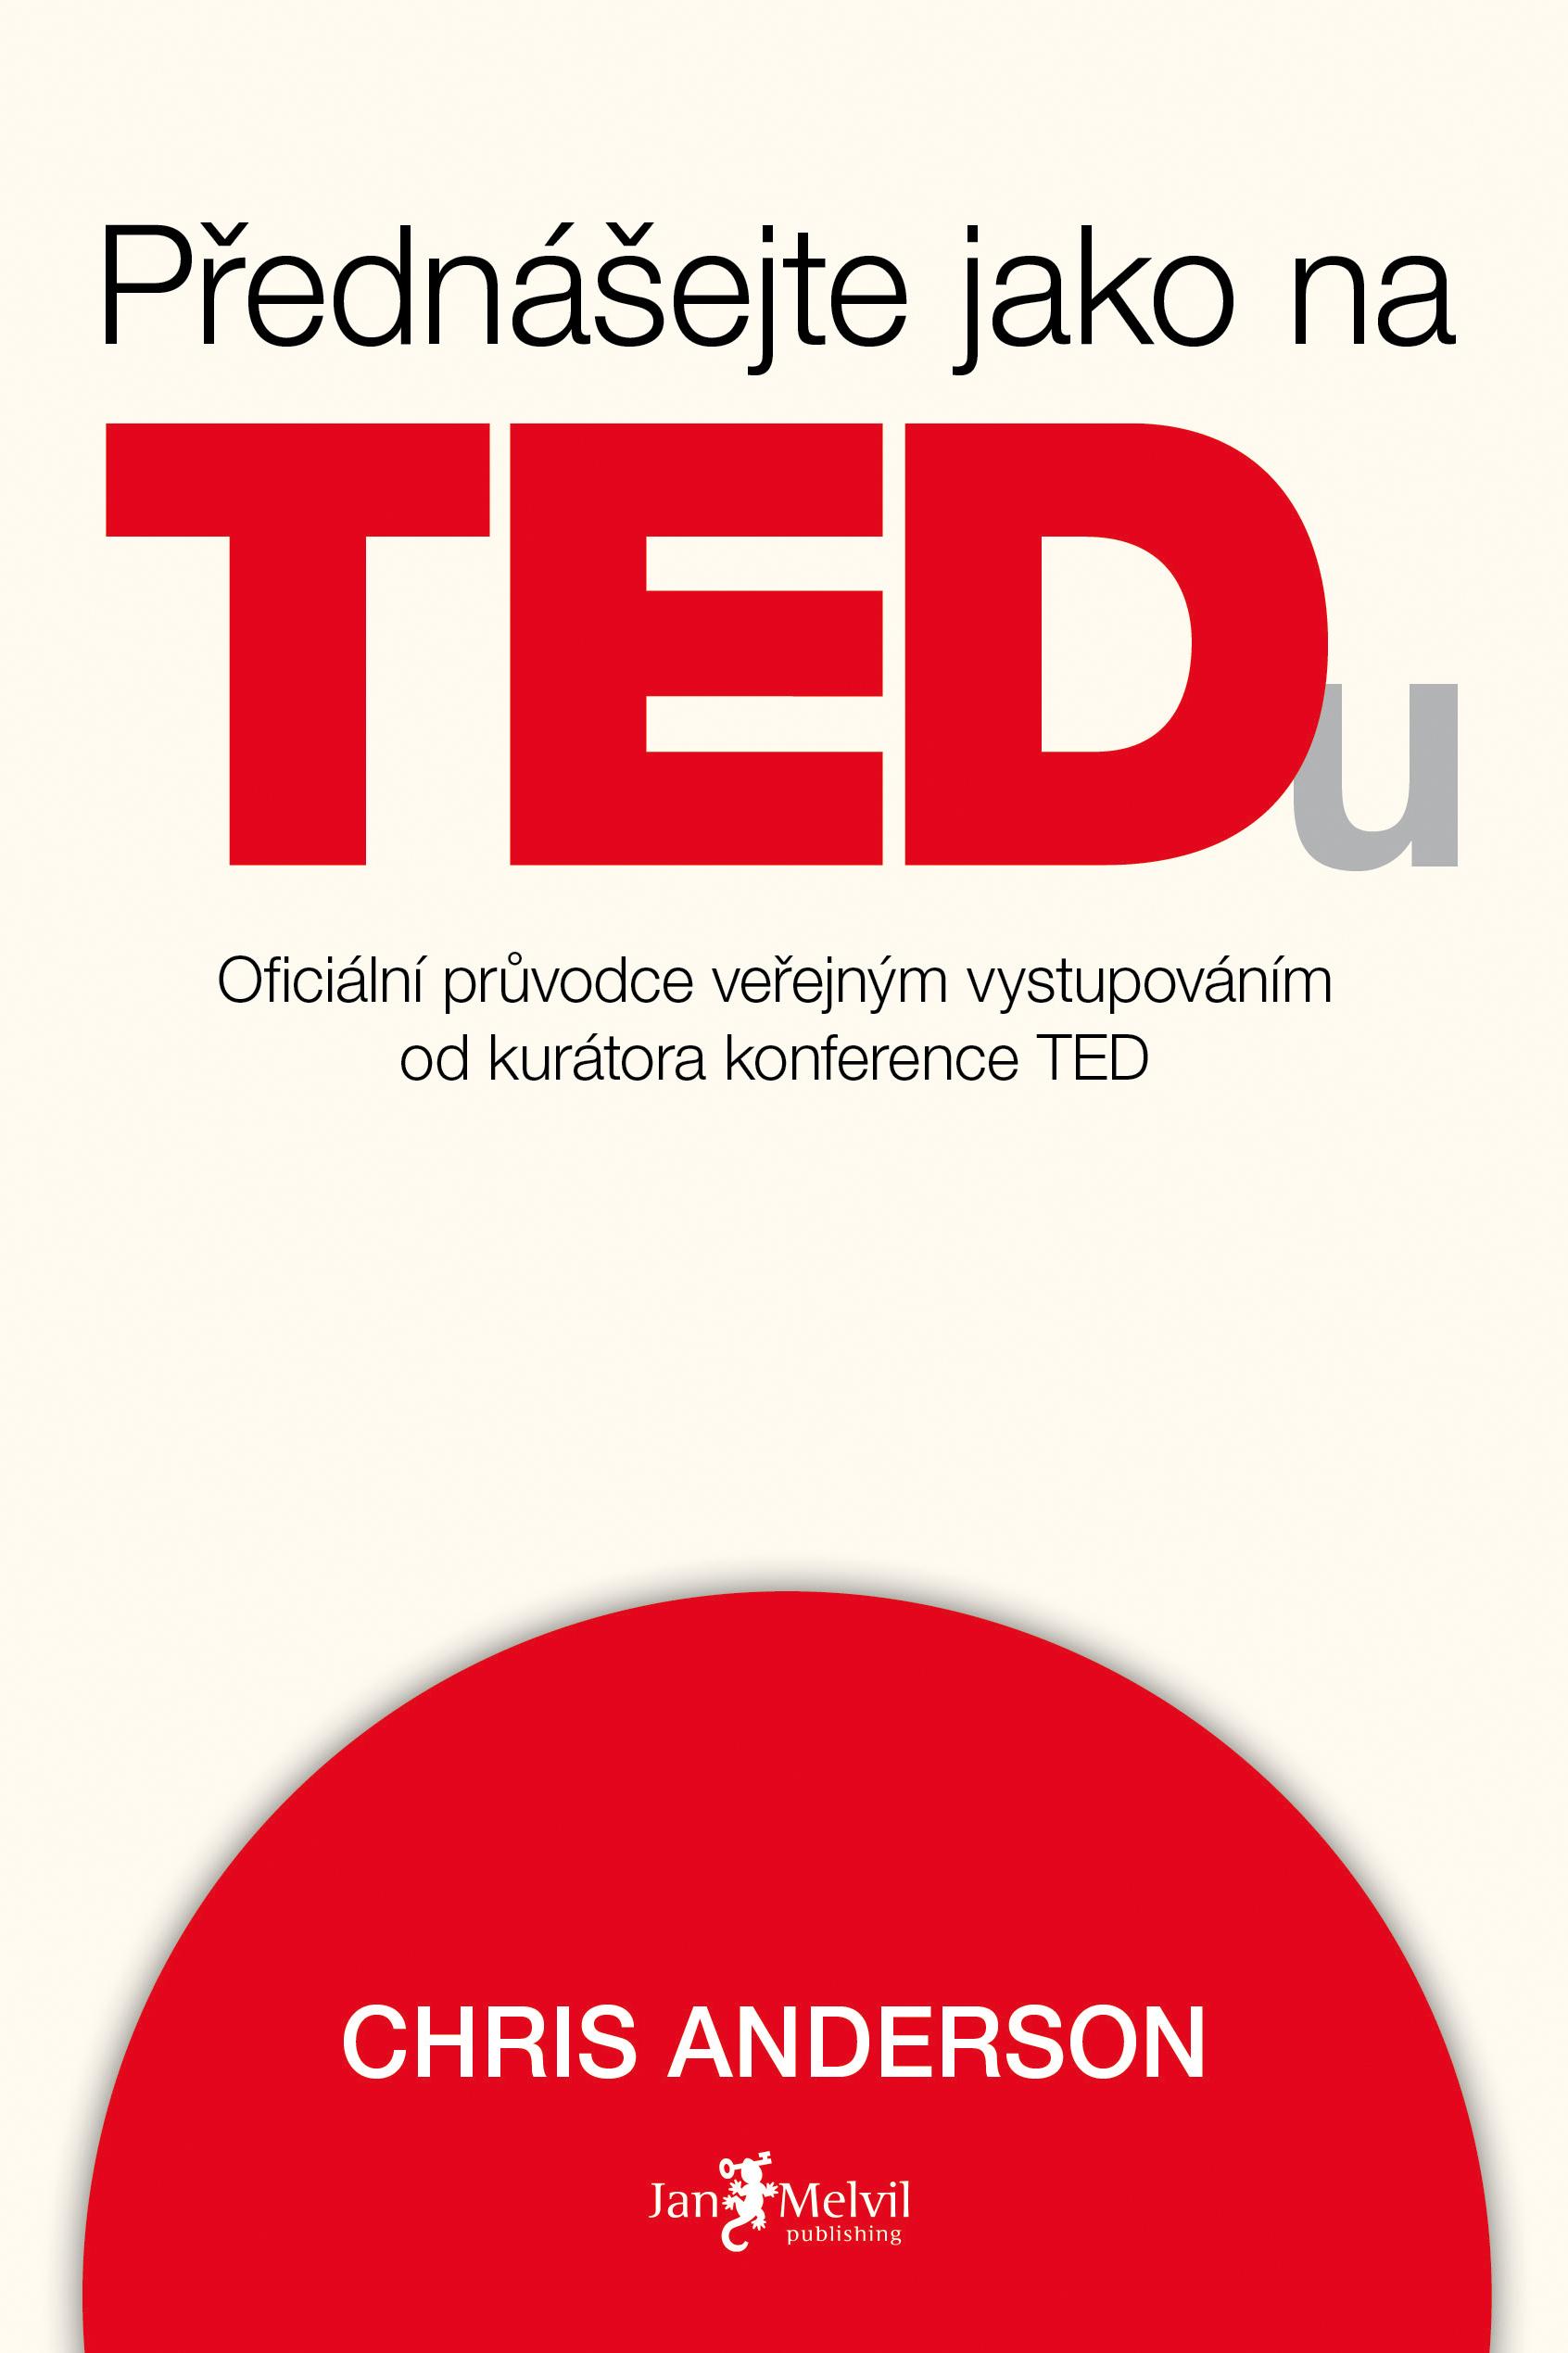 Přednášejte jako na TEDu - TED Talks: The Official TED Guide to Public Speaking, Chris Anderson